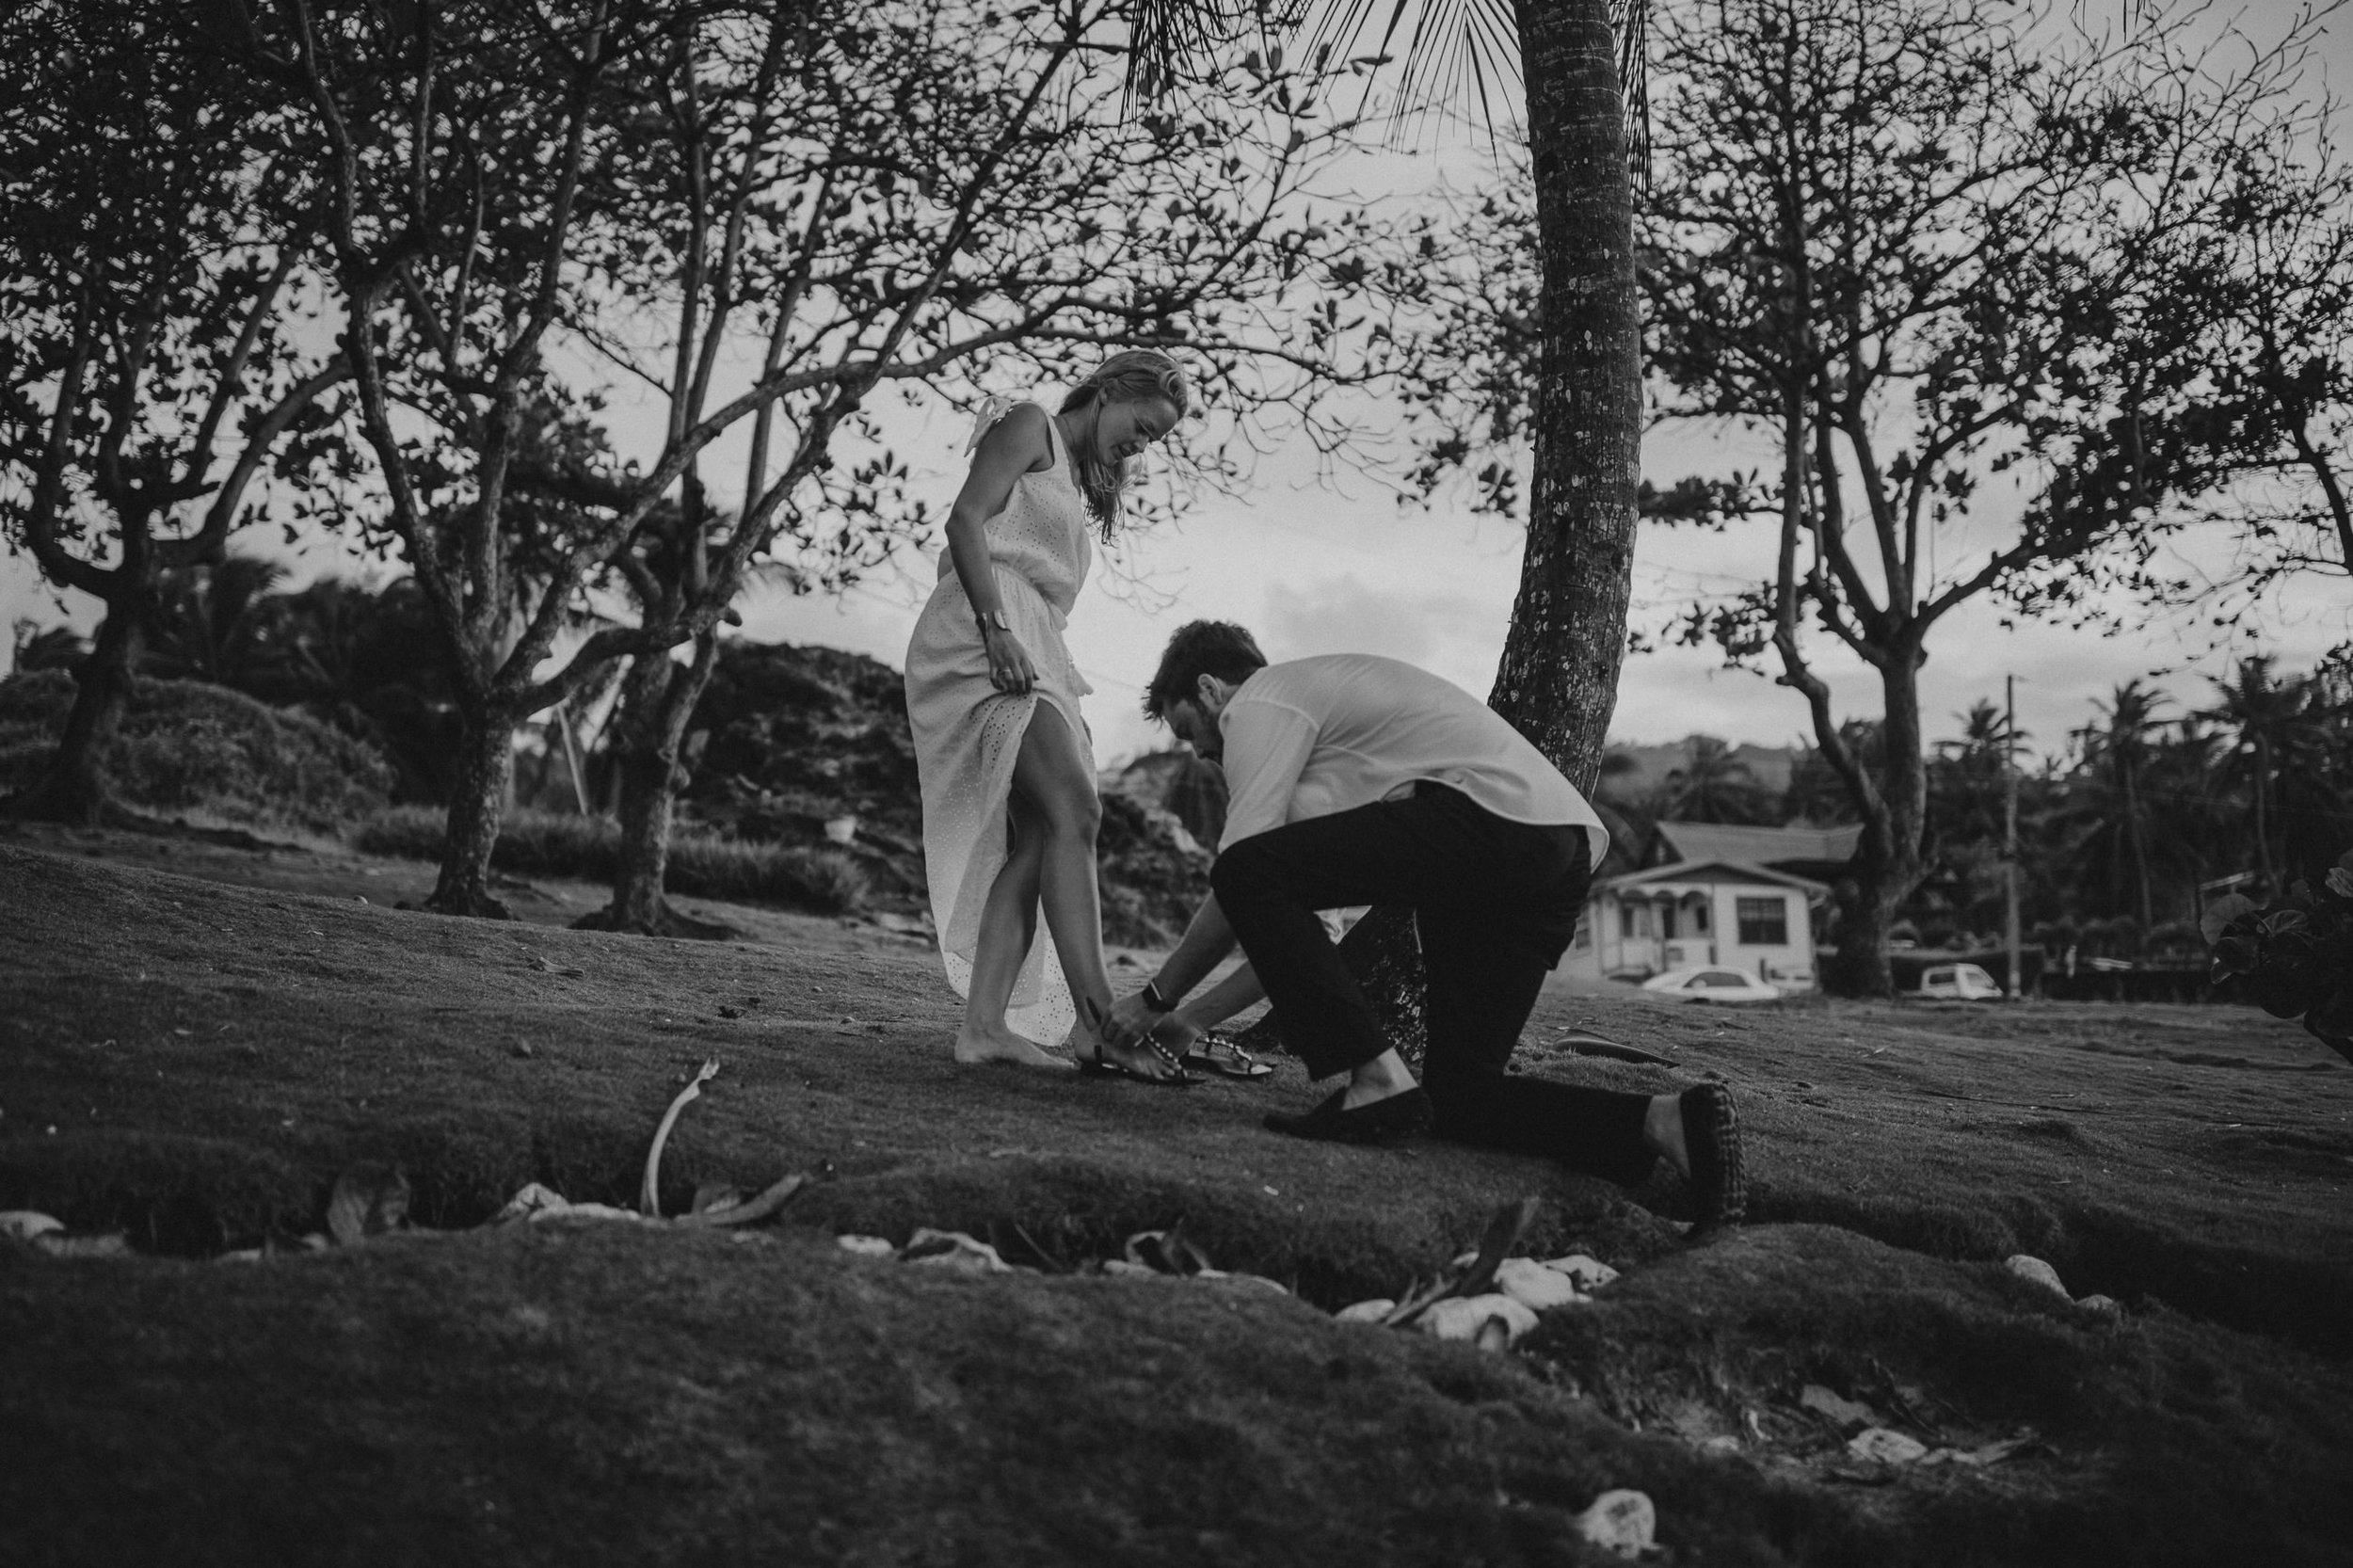 barbados_wedding_portrait_photographer_64.jpg